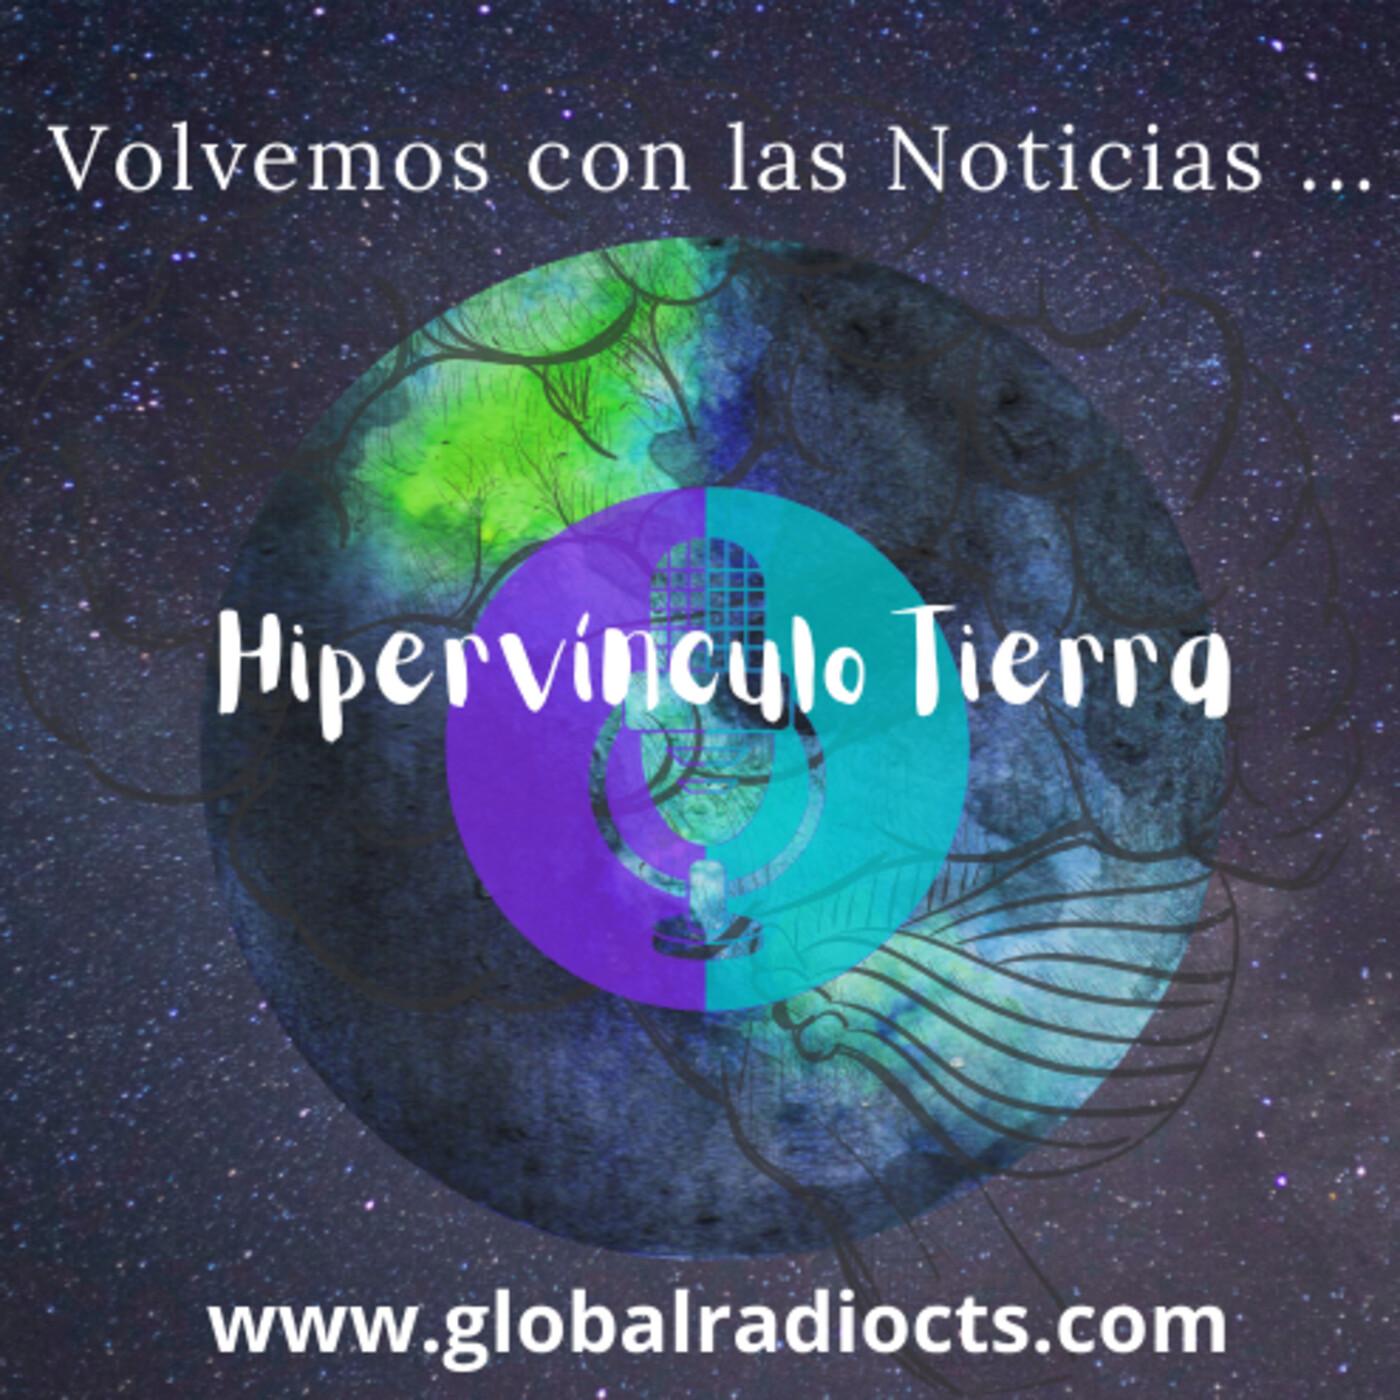 HIPERVINCULO TIERRA